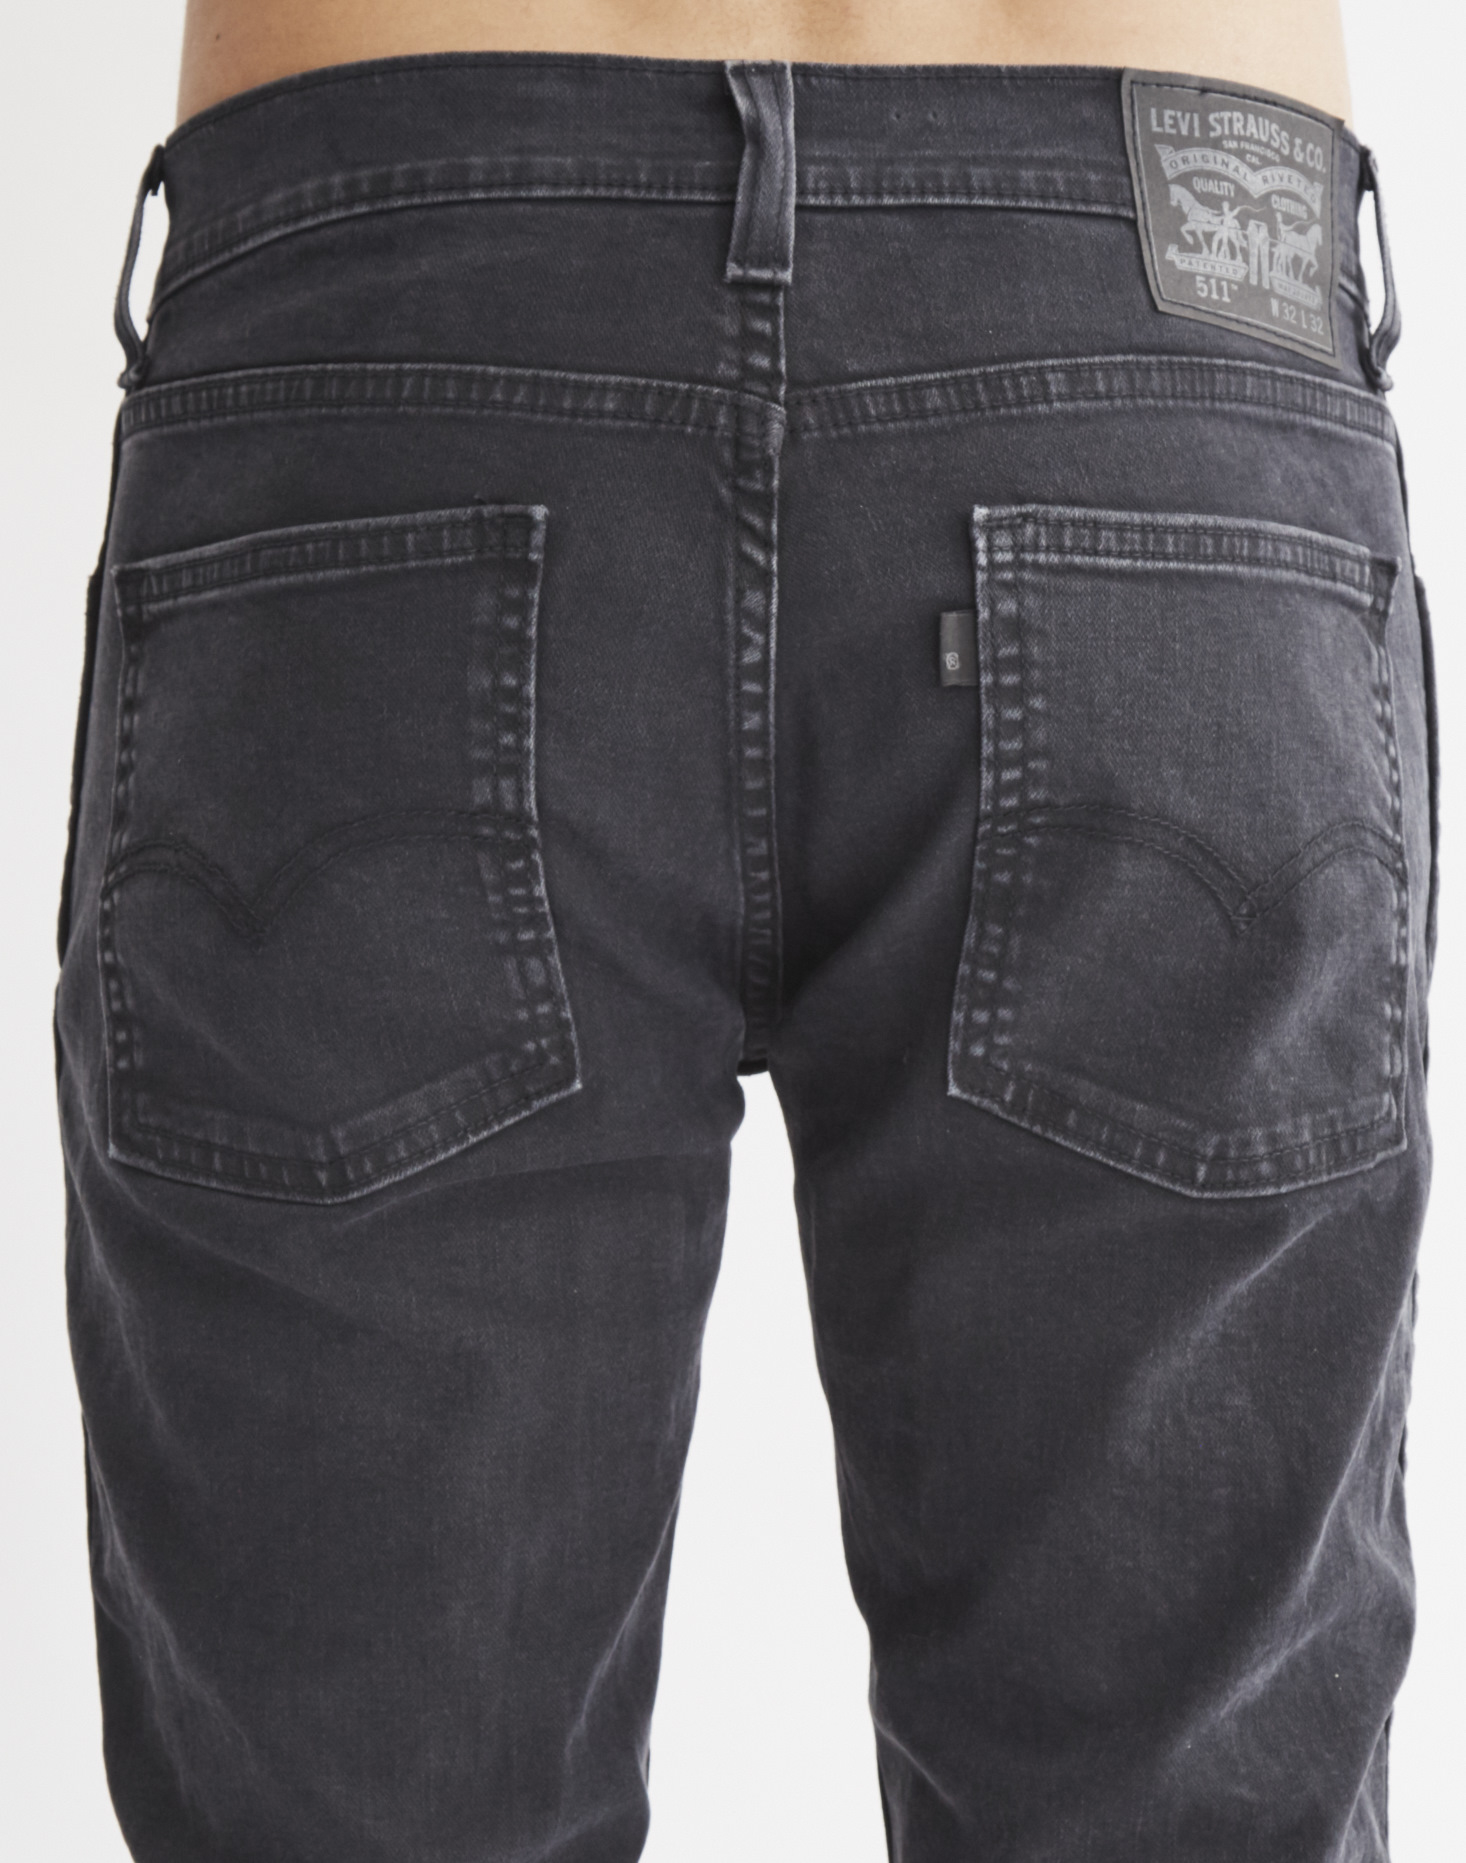 Dolce Gabbana Jeans For Men